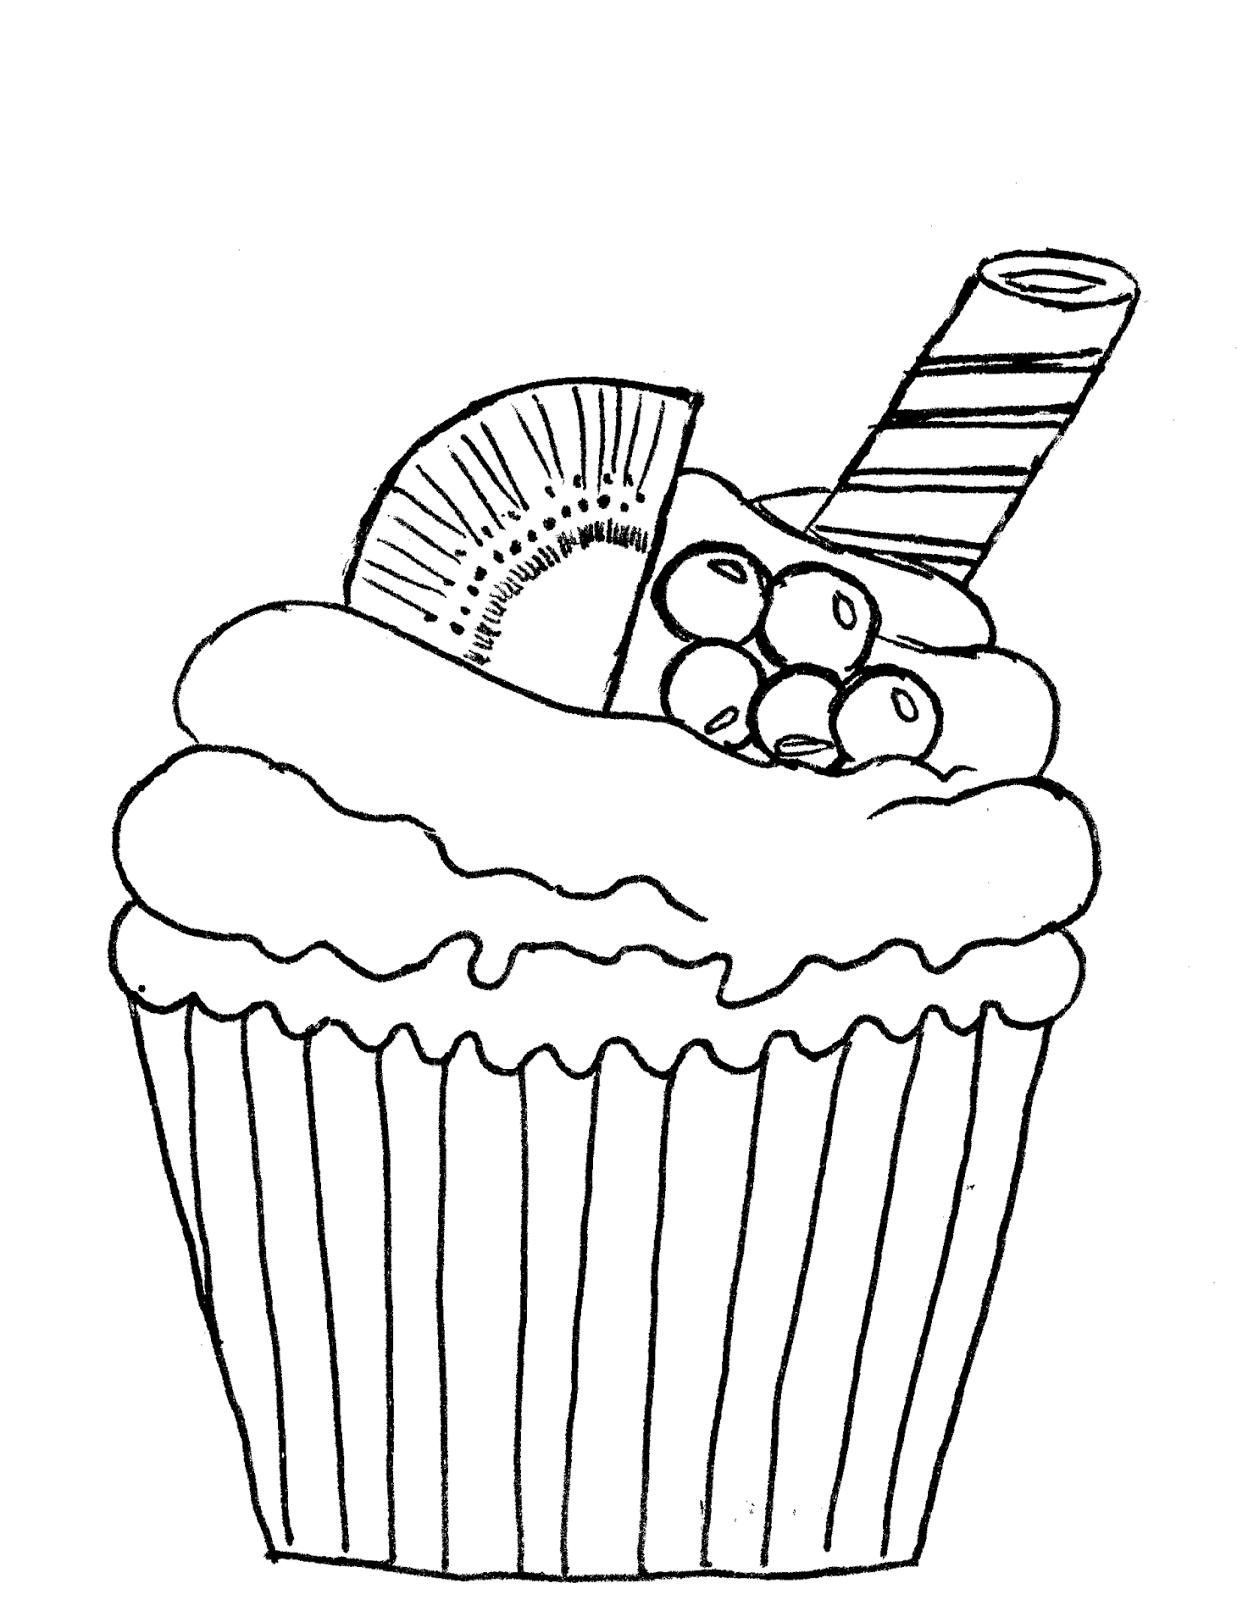 Mis Hojas de Papel Sellos Digitales cupcake kiwi muffin